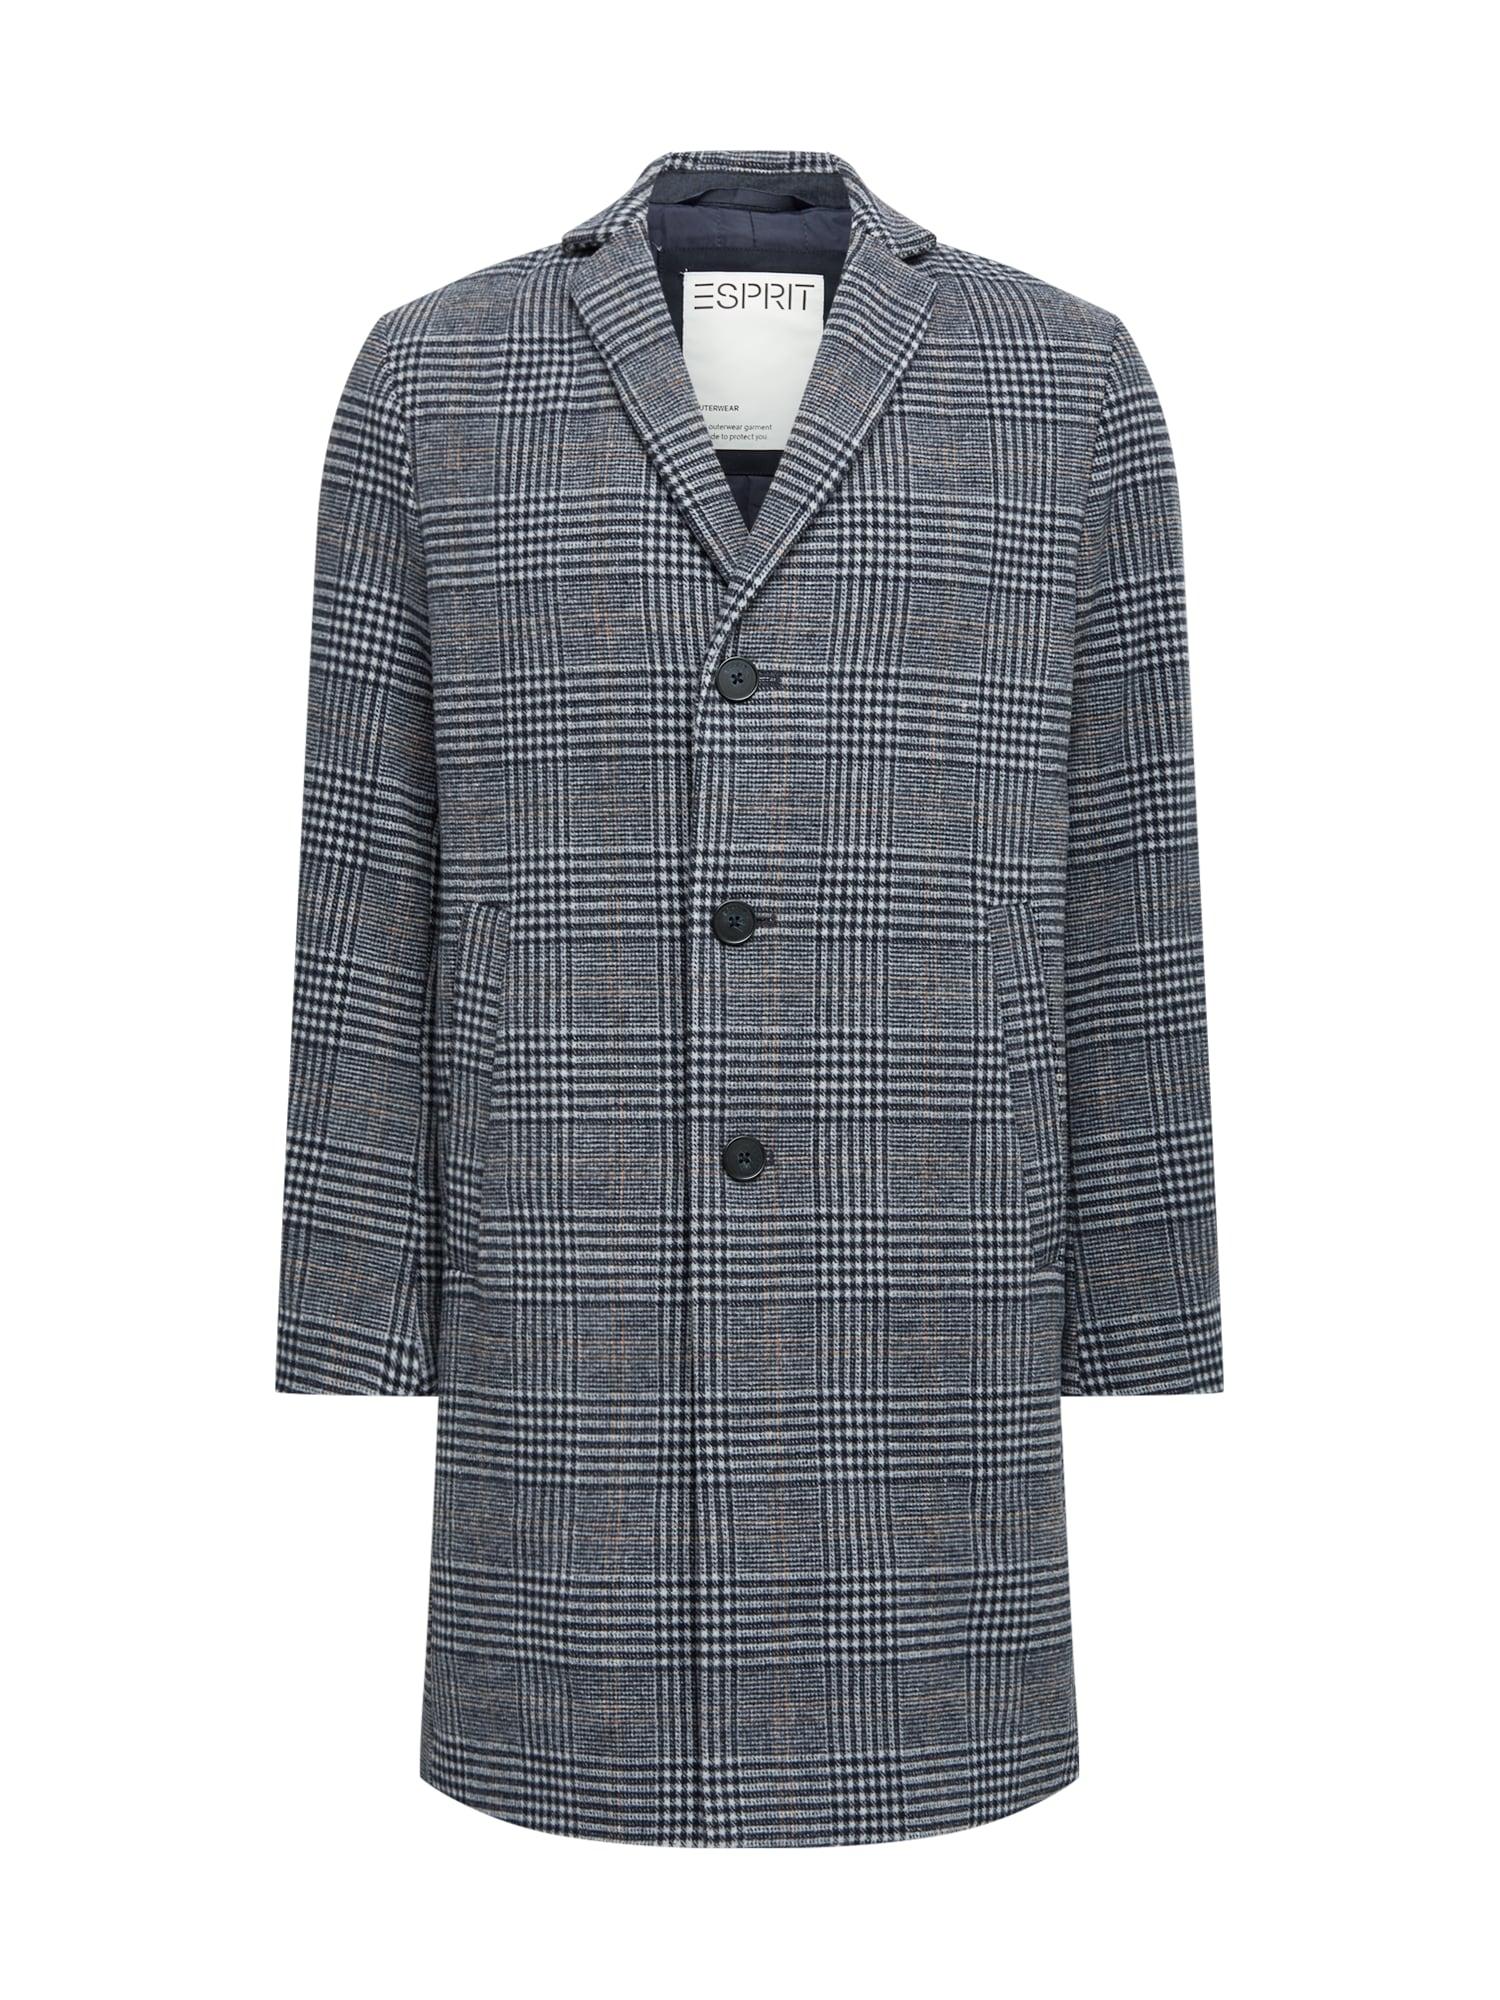 ESPRIT Demisezoninis paltas tamsiai mėlyna / pilka / juoda